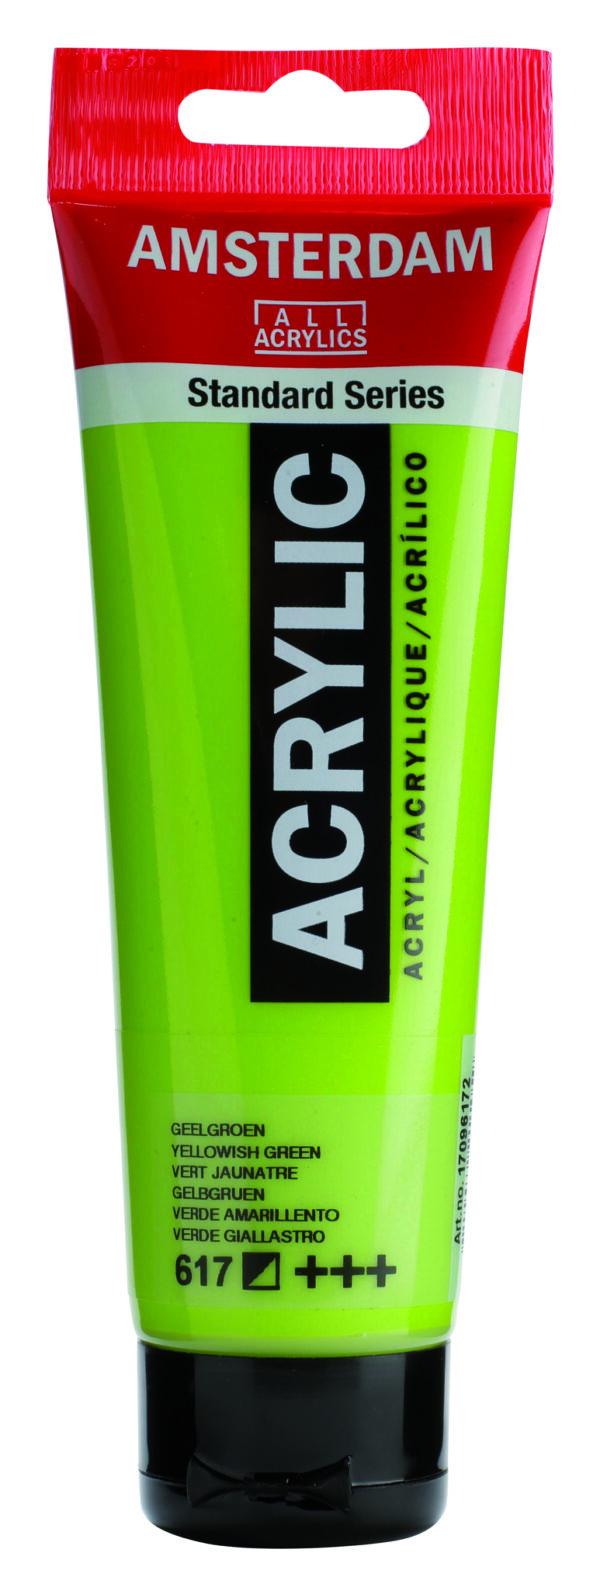 Ams std 617 Yellow green - 120 ml